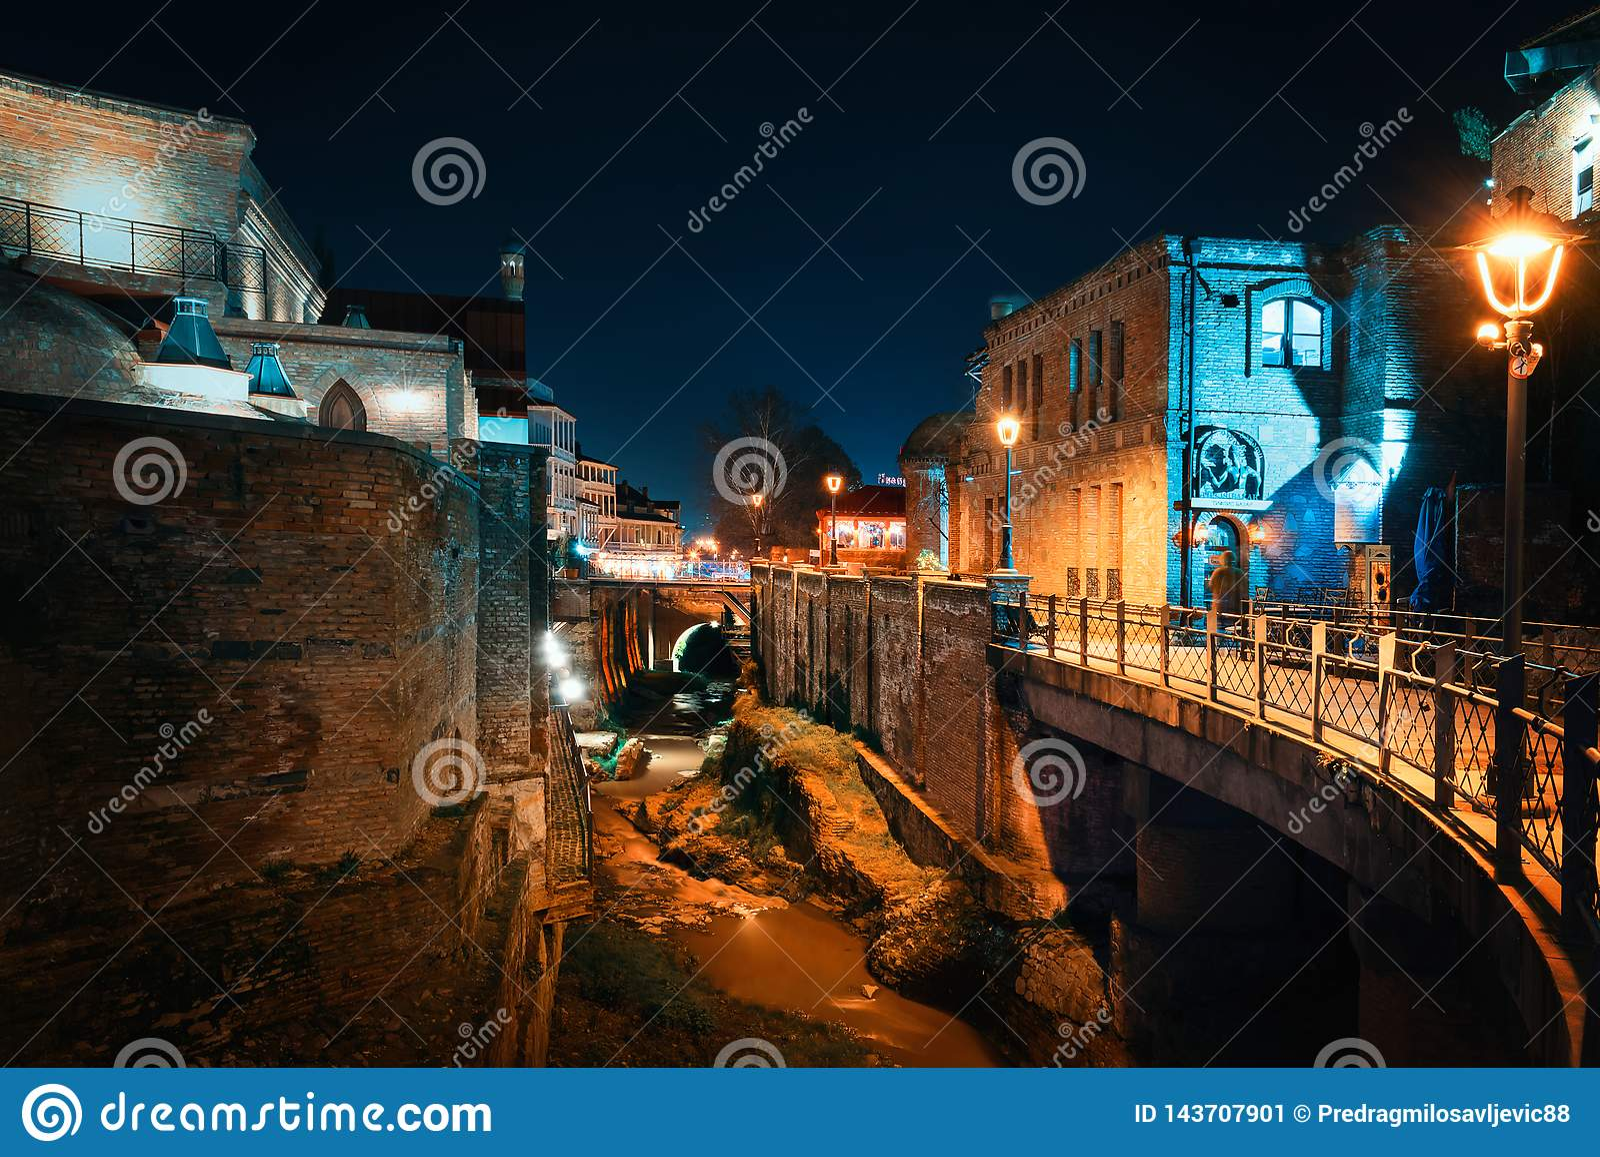 Georgia, Tbilisi - 05.02.2019. - Night time in Tbilisi old town Abanotubani, sulphur baths district